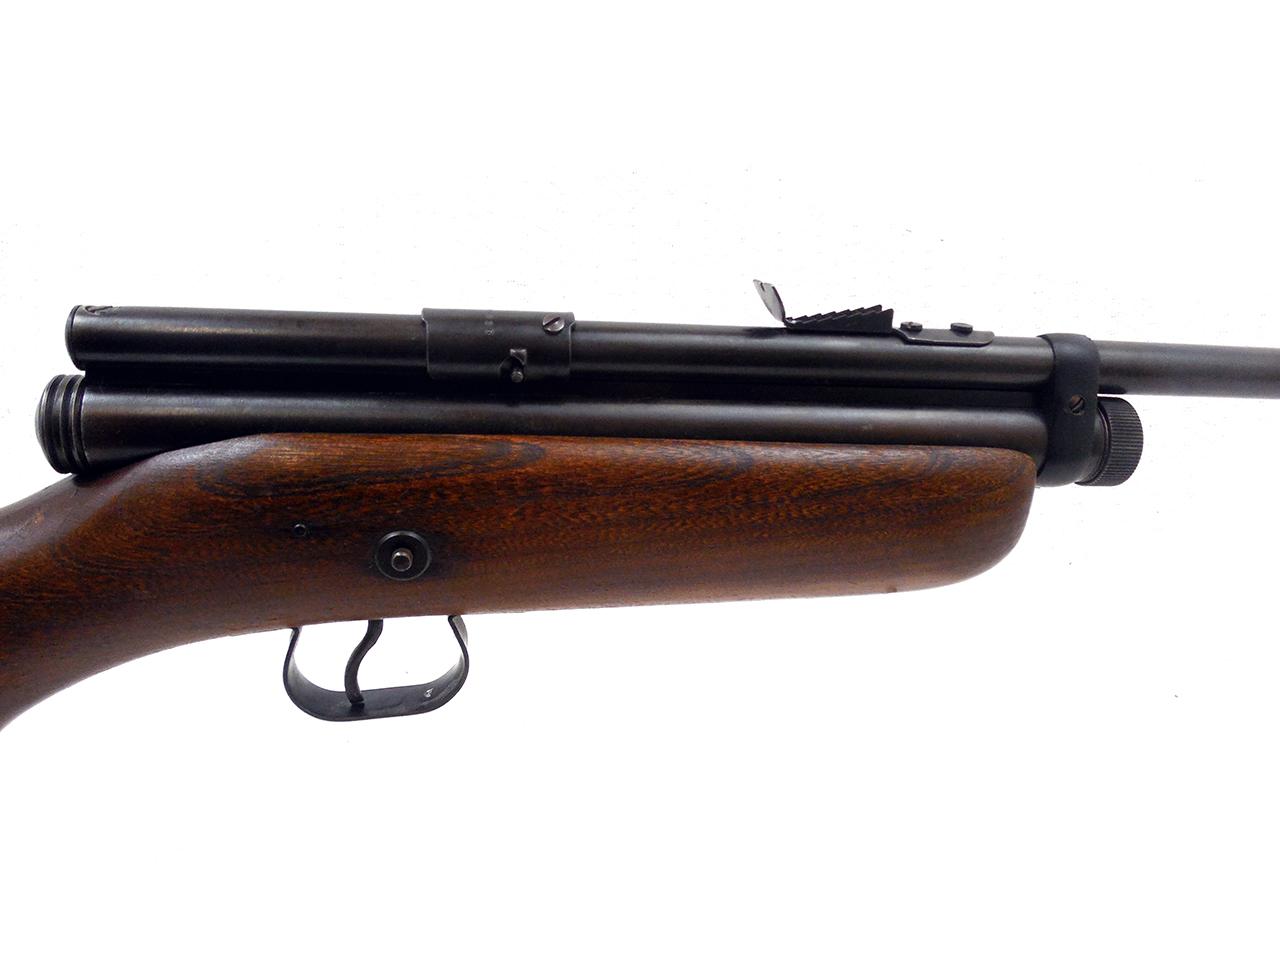 Schematics Crosman 180 Dpms Sears Higgins Sku Baker Airguns 1280x960